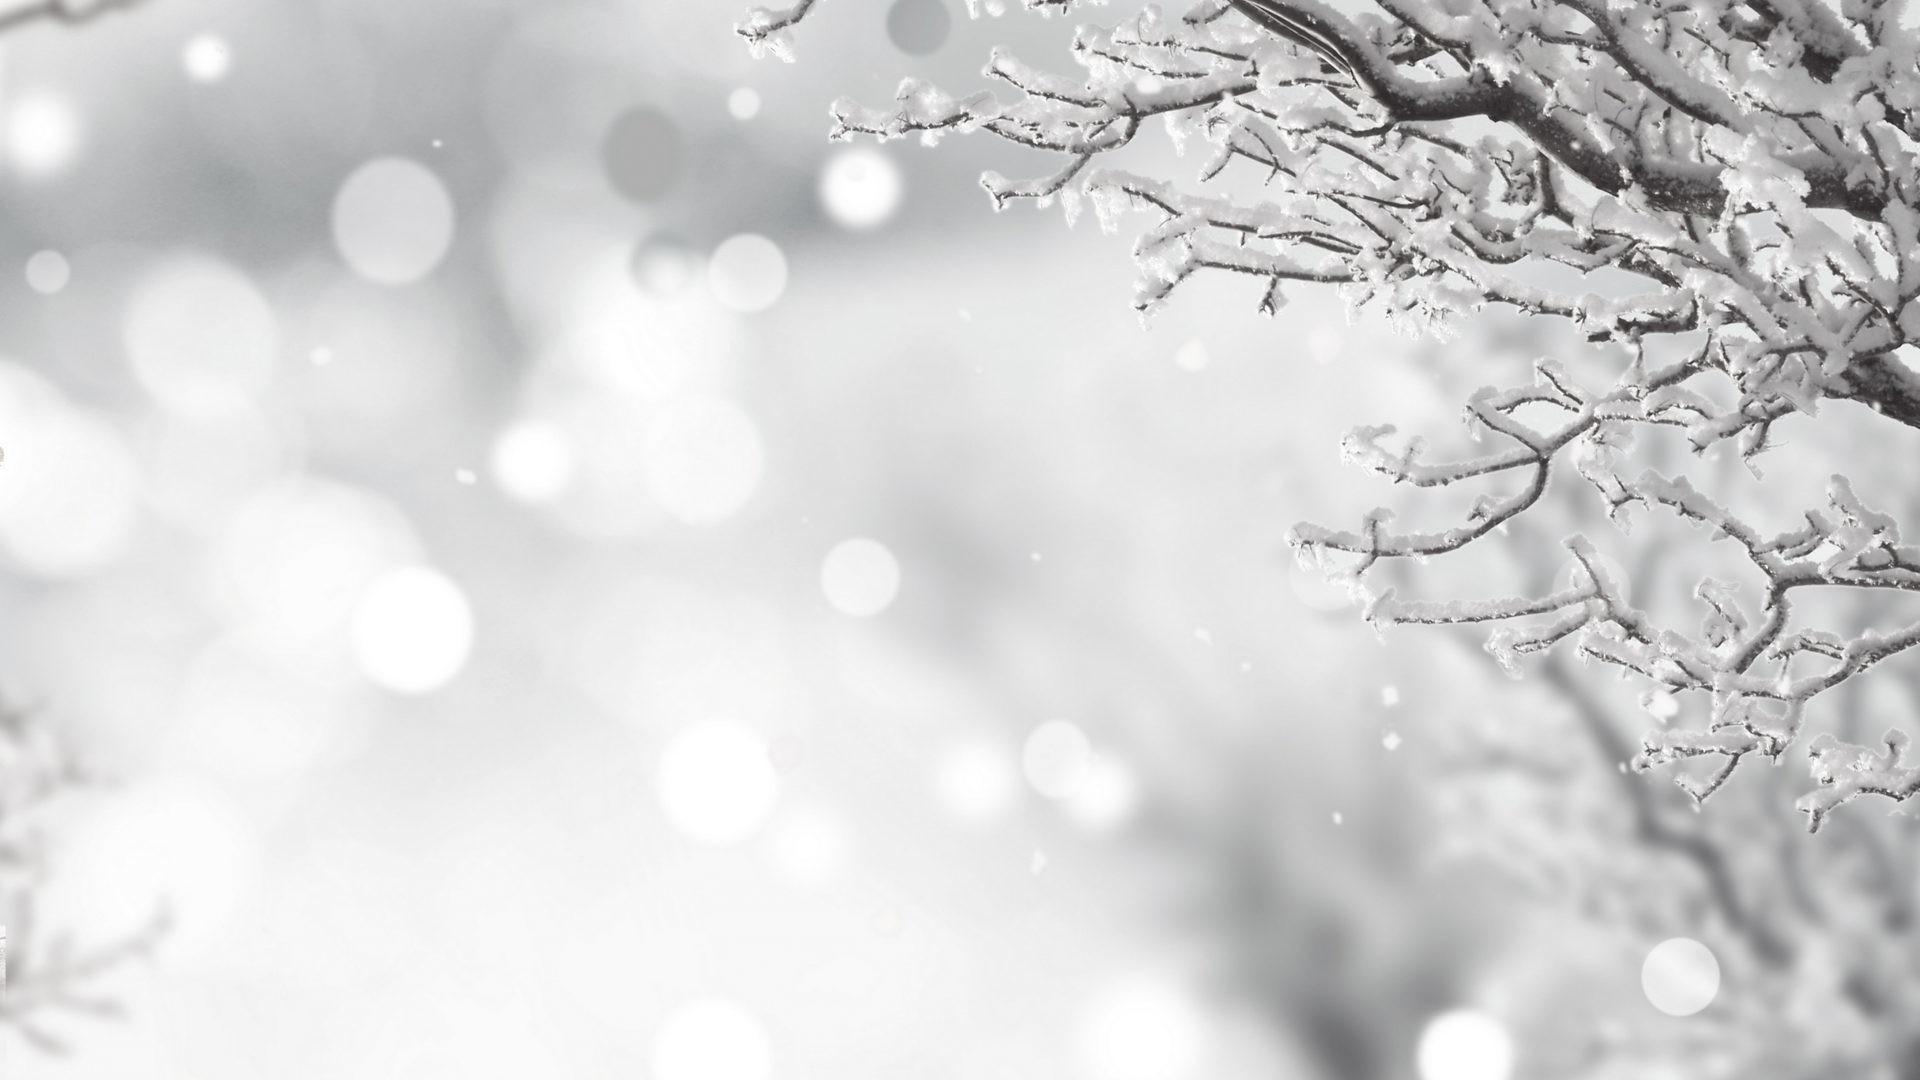 Splendor Christmas Xmas Bokeh Merry Time Magic Snow Holidays Tree Snowy  Winter Elegant Wallpaper – 4350×3518